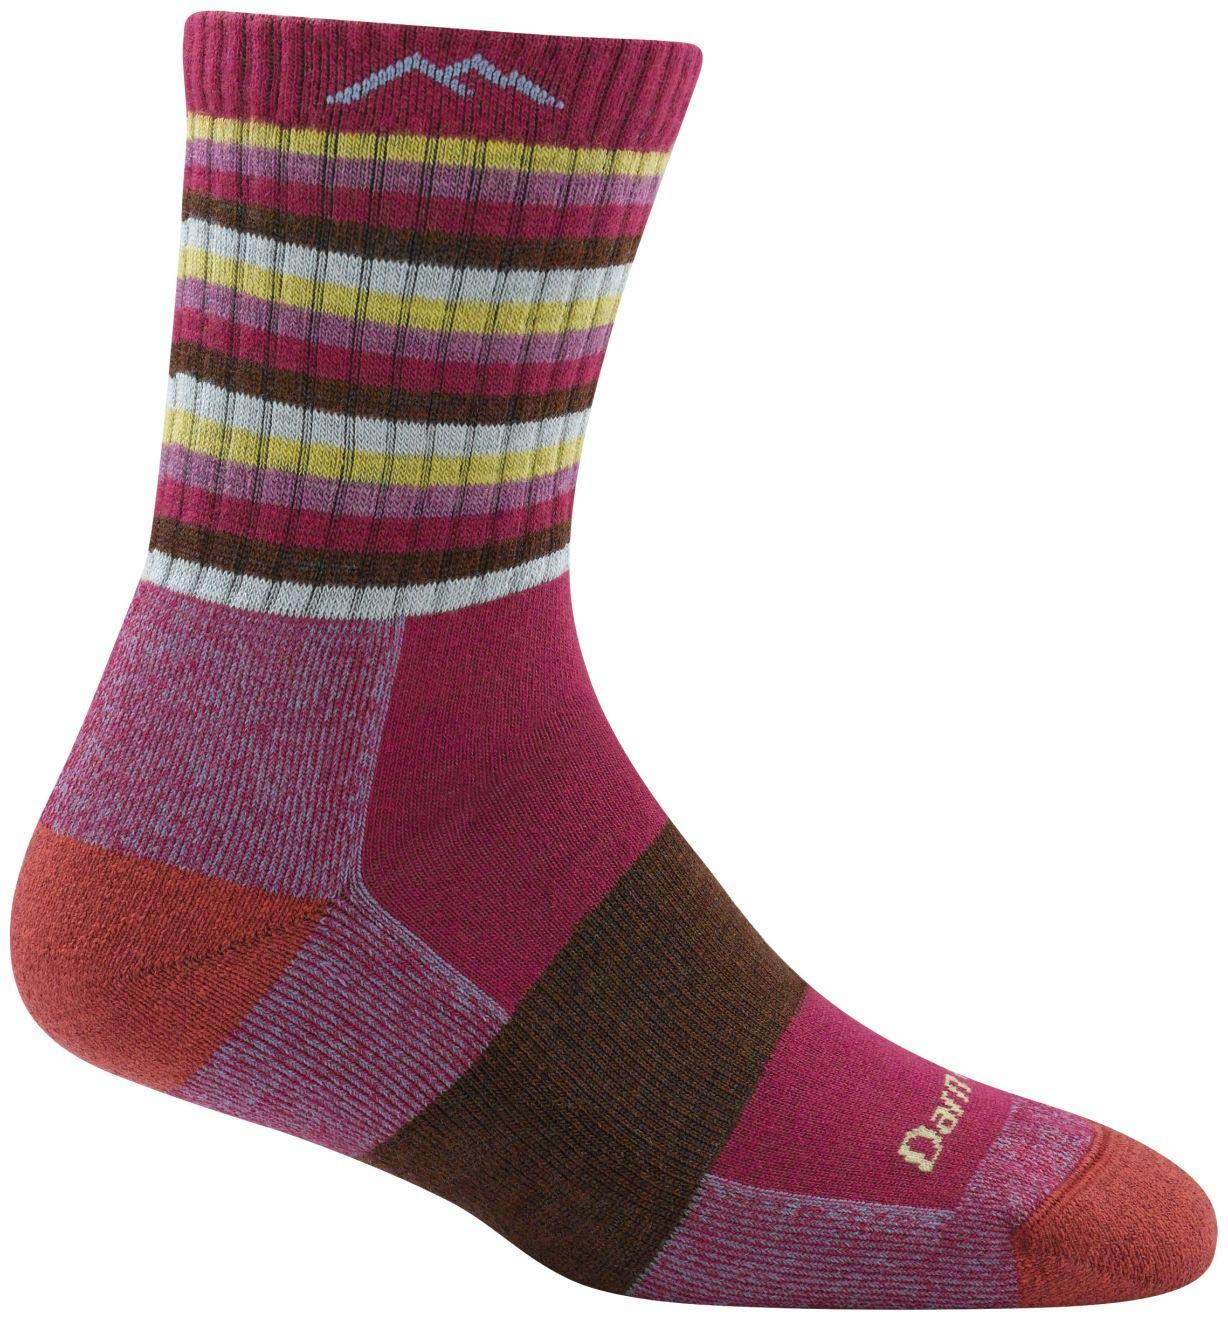 Darn Tough Coolmax Stripes Micro Crew Cushion Socks - Women's 1942